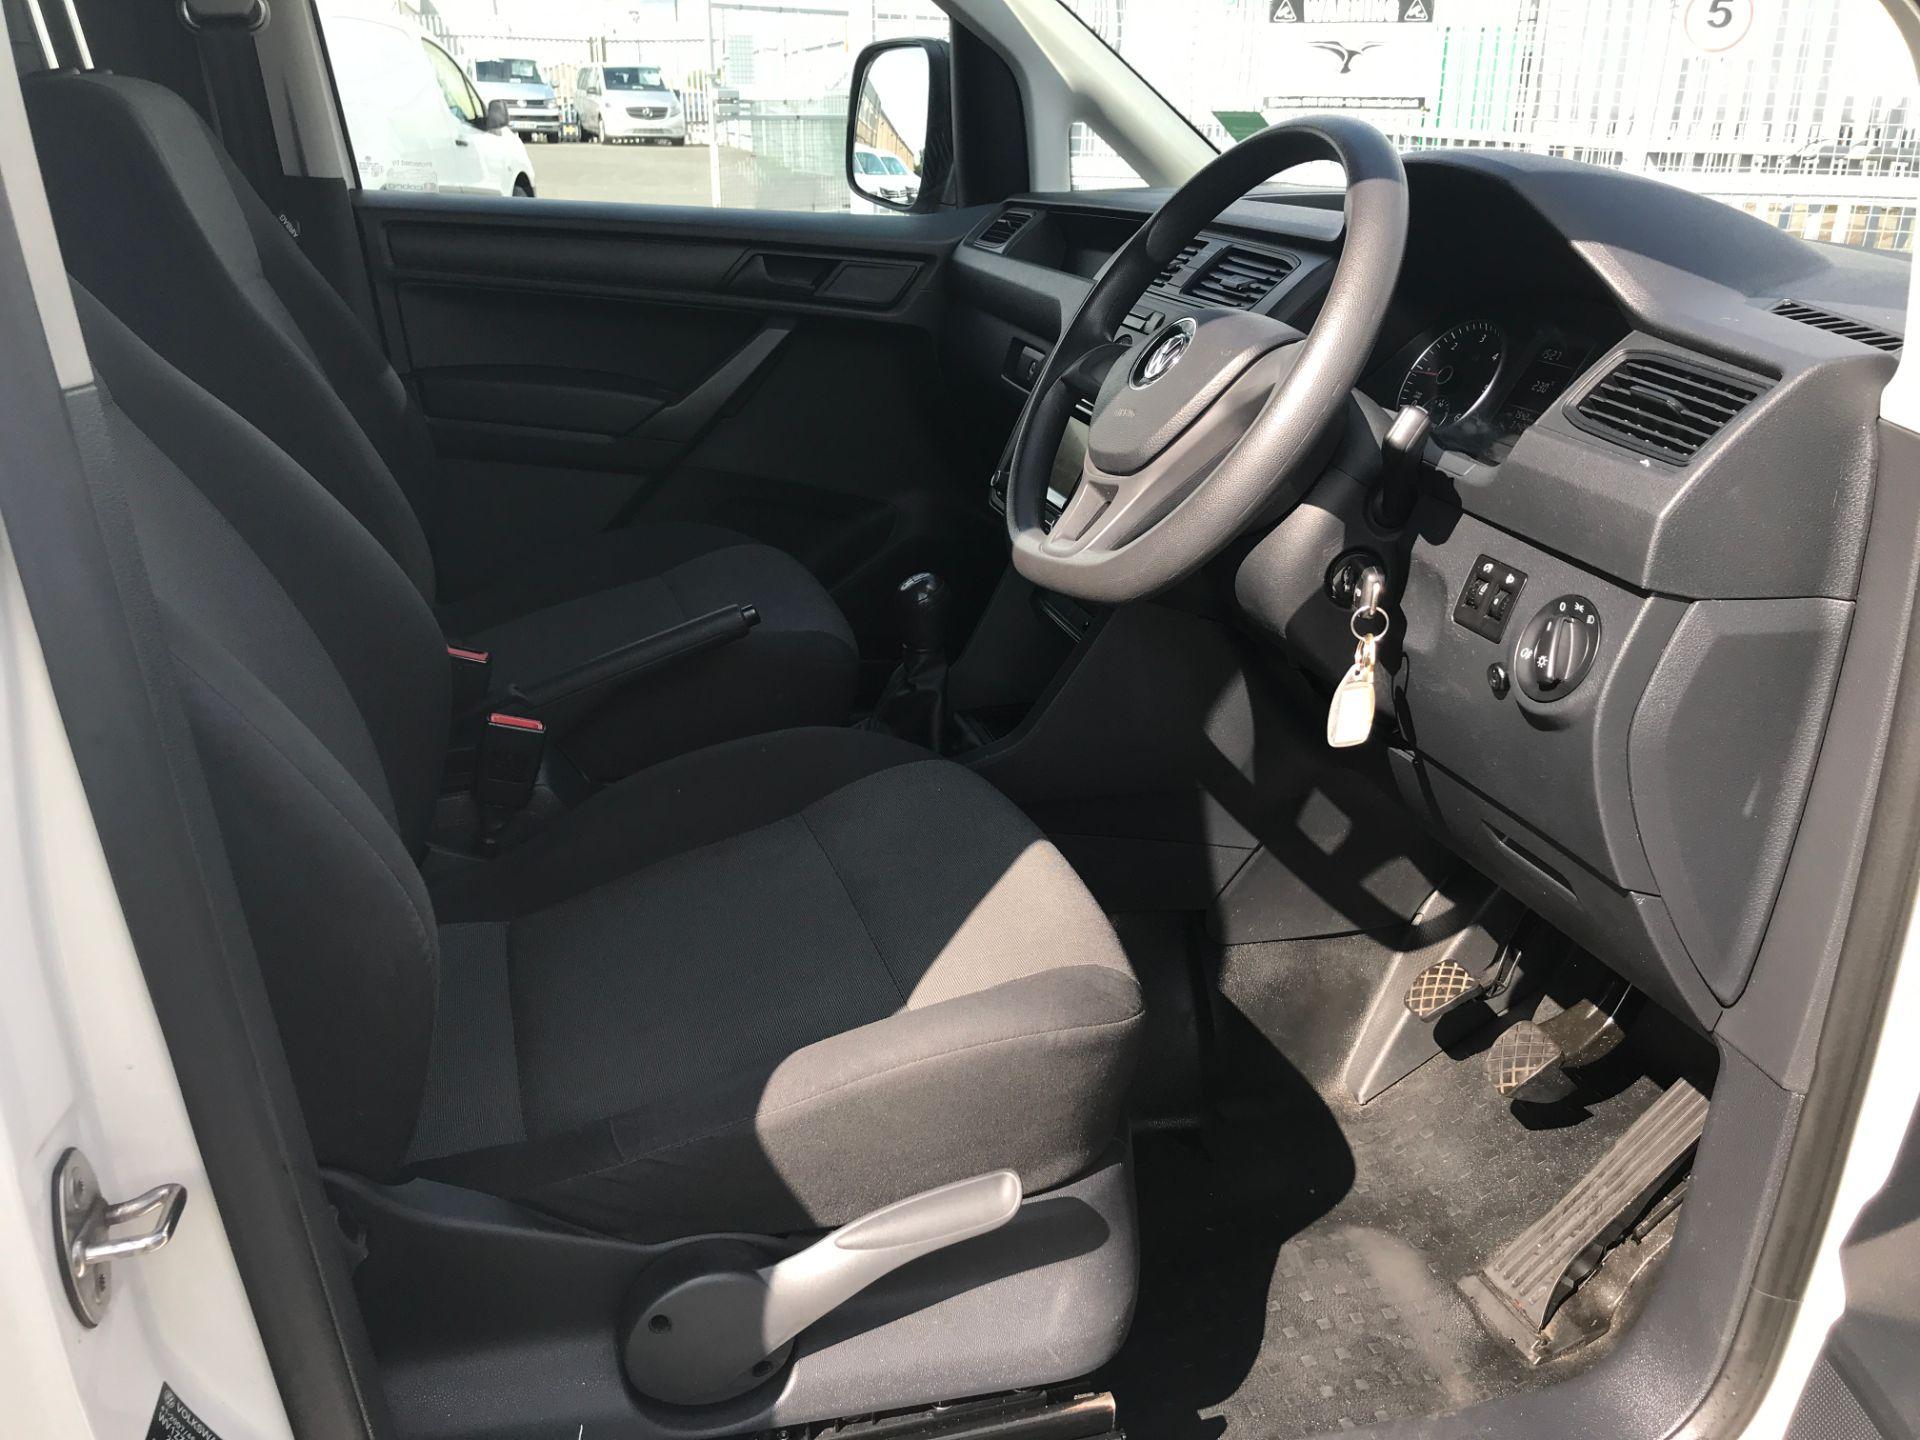 2017 Volkswagen Caddy Maxi 2.0TDI BLUEMOTION TECH 102PS STARTLINE EURO 6 (GK17VCN) Image 2